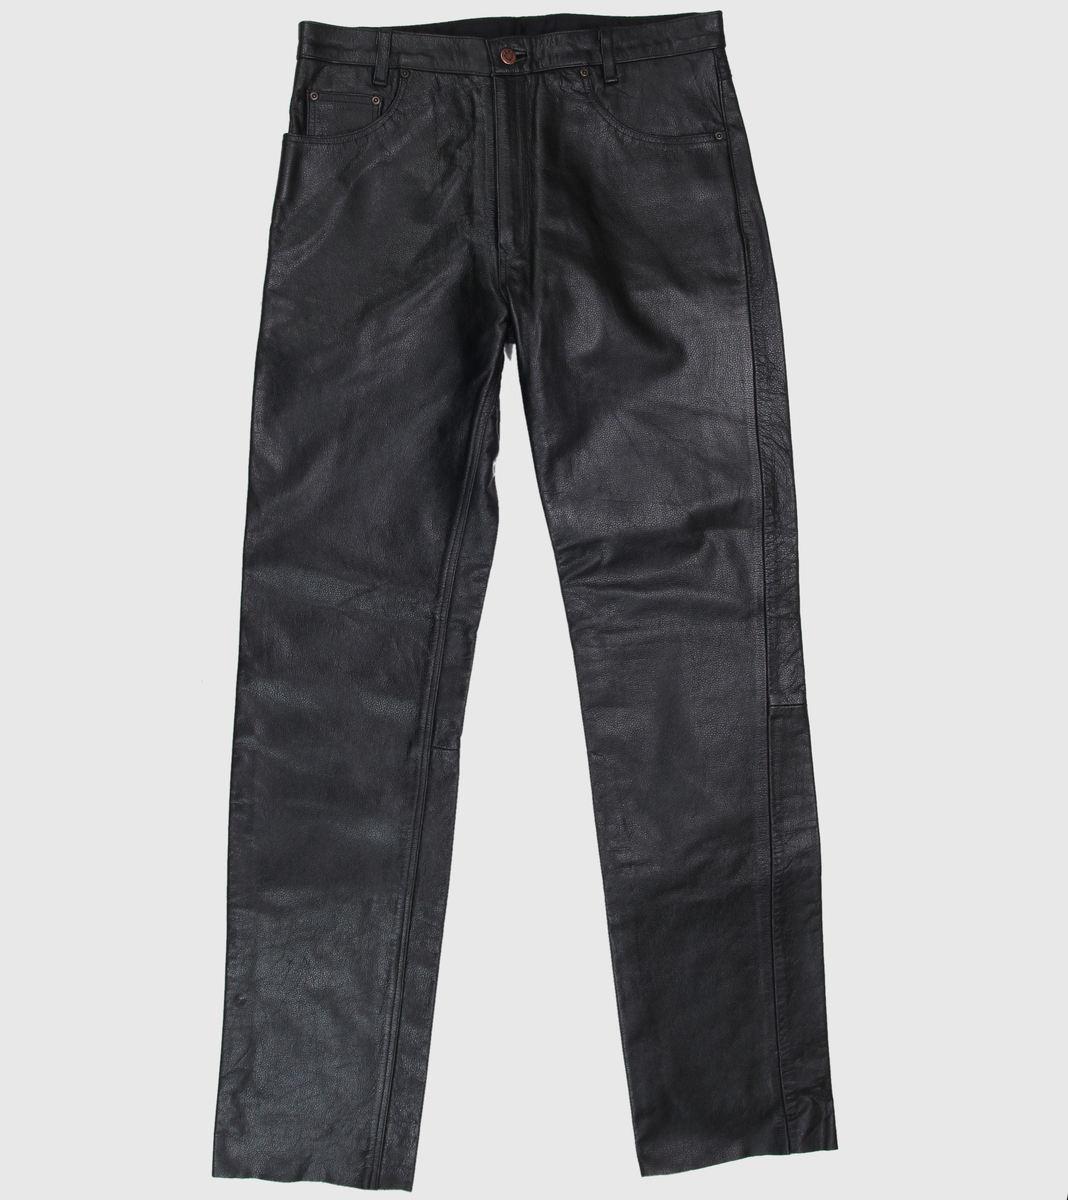 kalhoty pánské BRIXTON - Black - BRX02